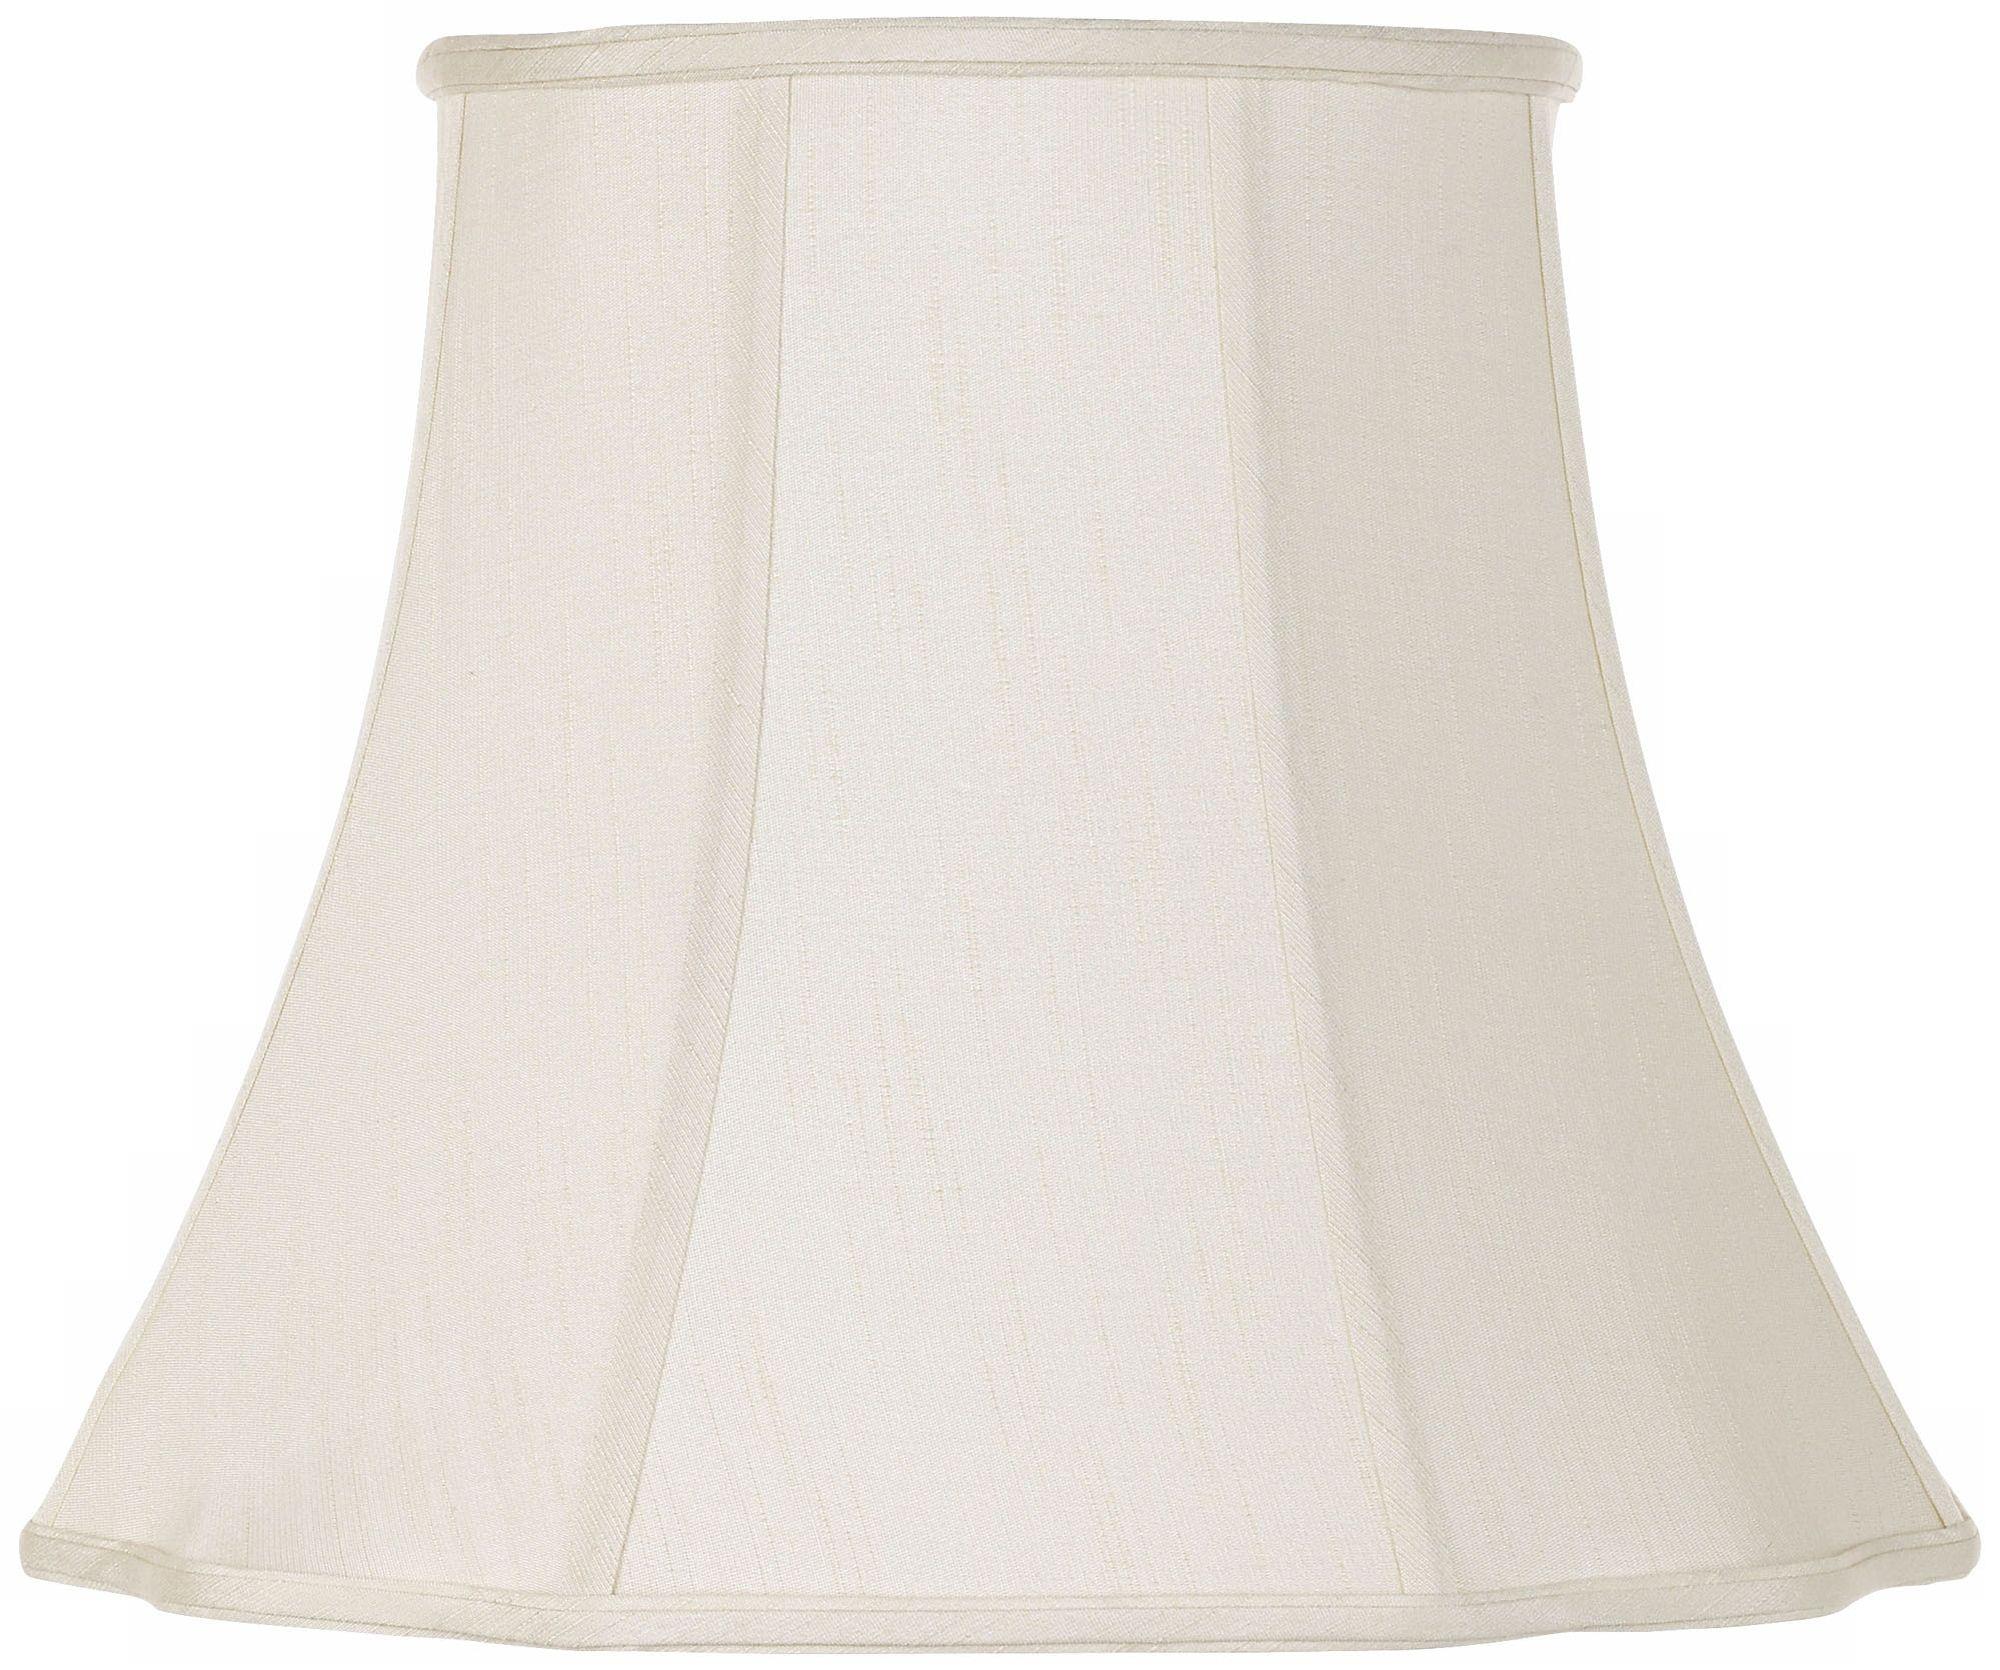 Charmant Creme Bell Curve Cut Corner Lamp Shade 11x18x15 (Spider)